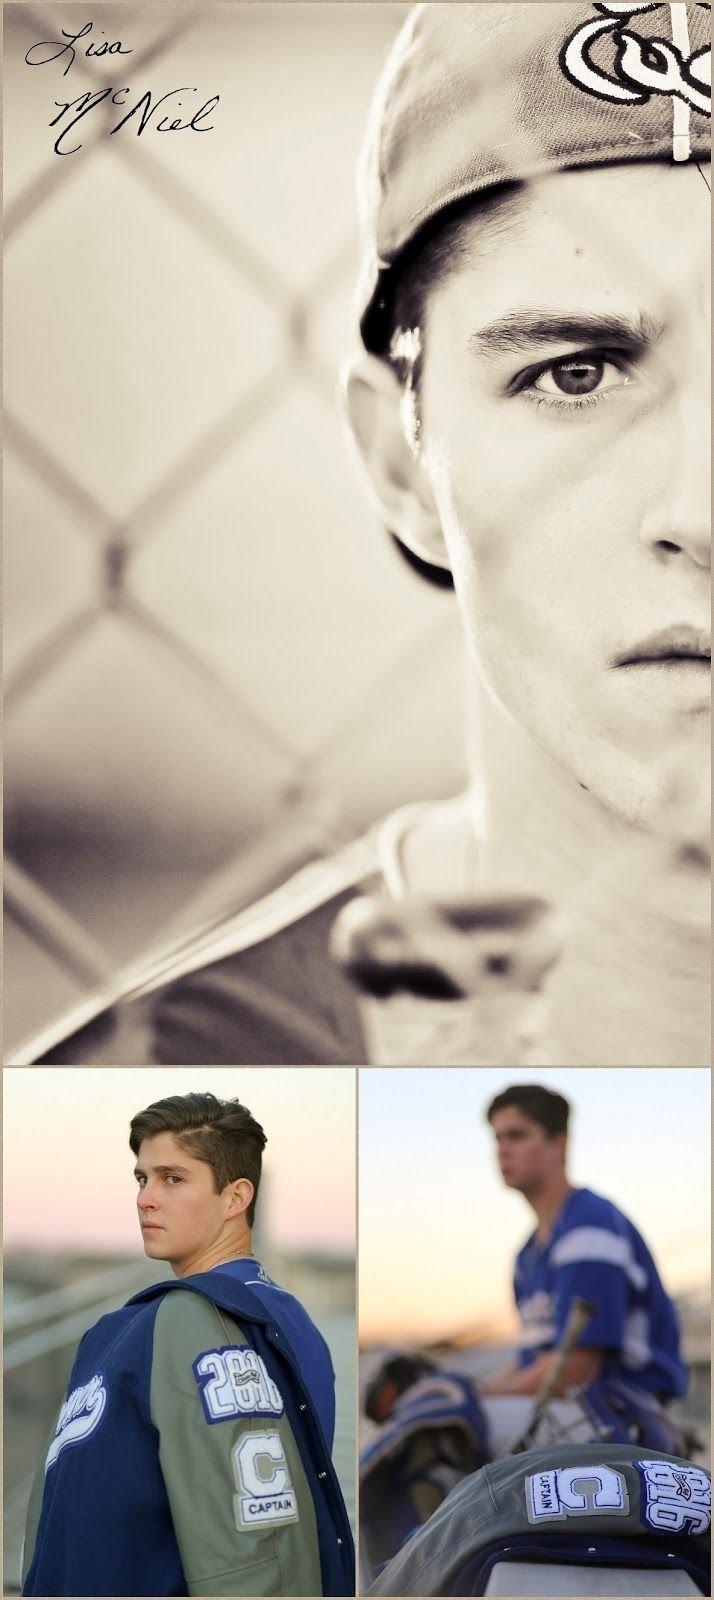 10 Lovely Senior Project Ideas For Guys 78 best senior pictures guys images on pinterest senior pictures 1 2020